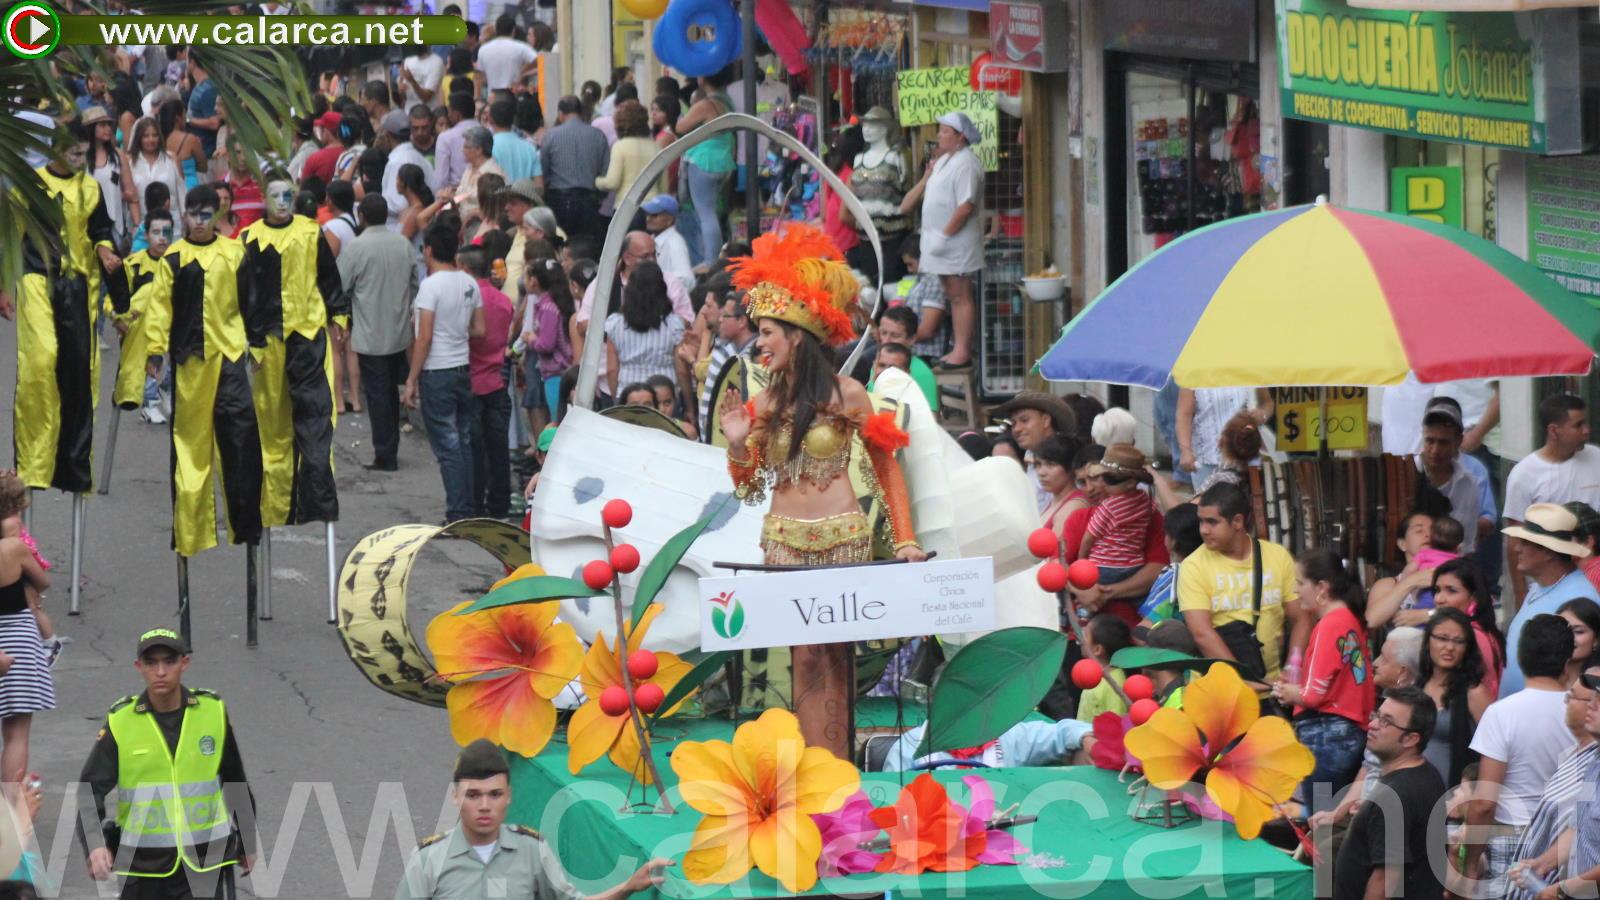 Valle - Lorena Collazos Muriel